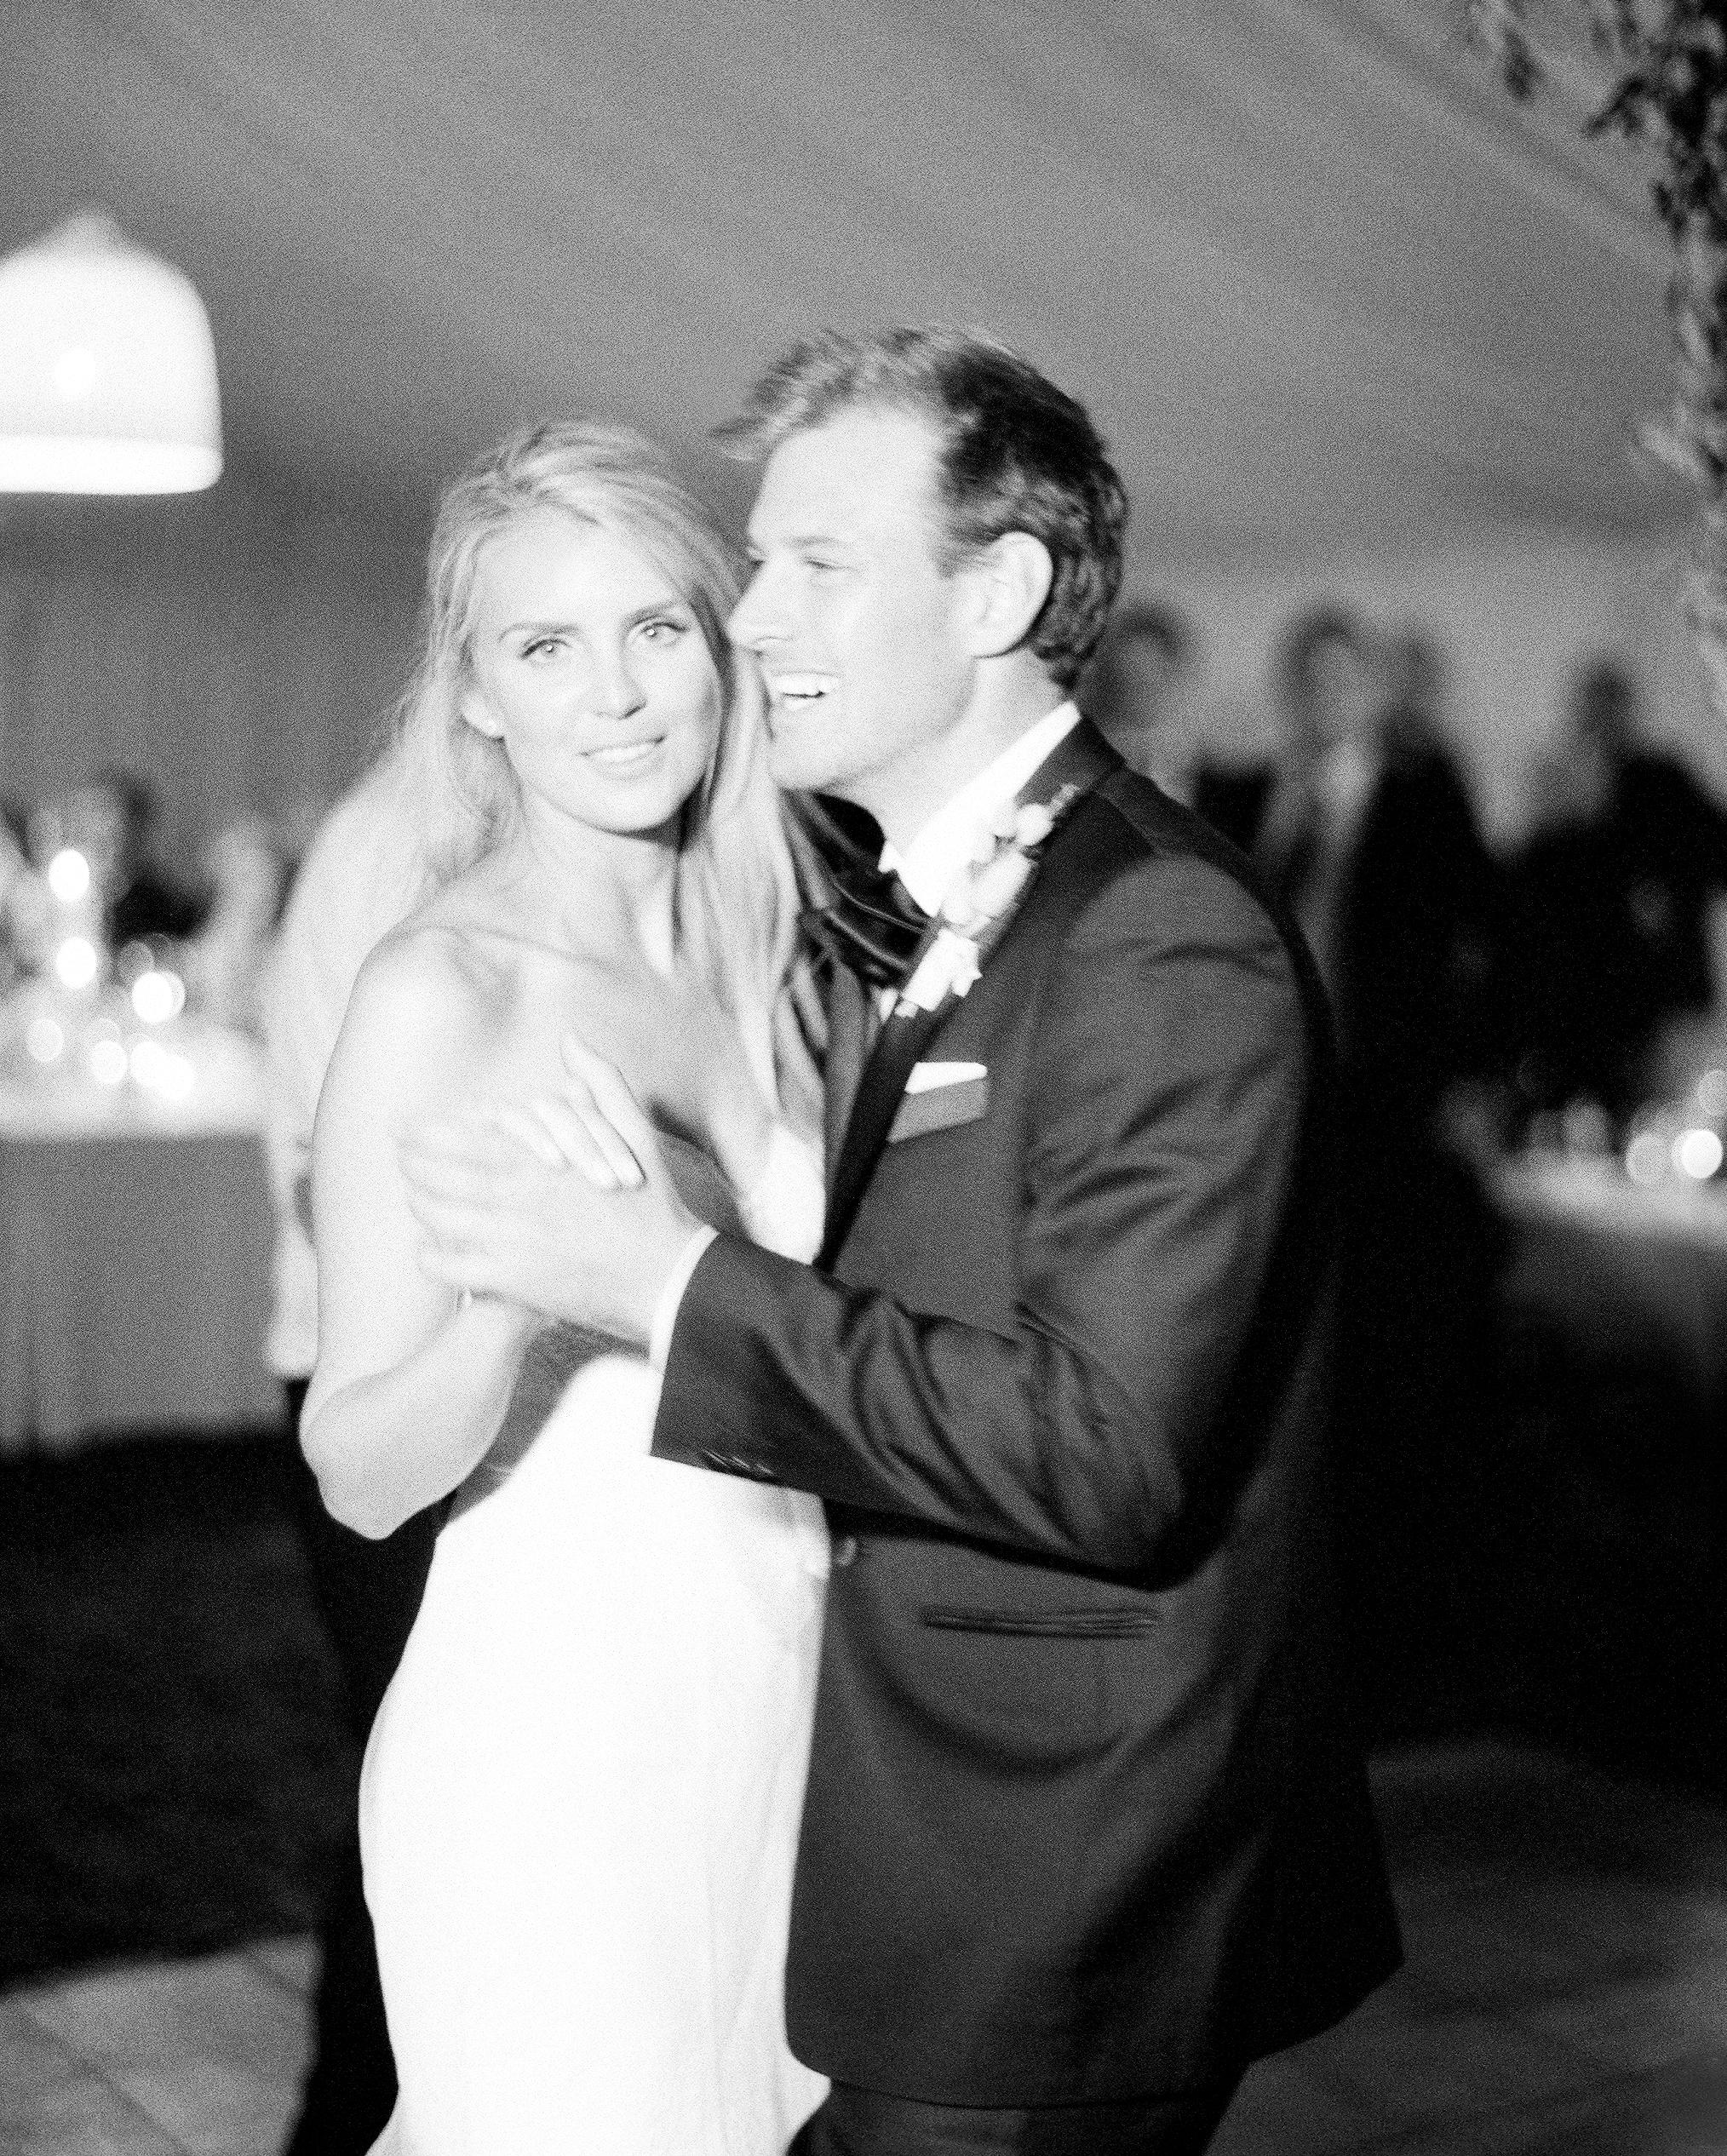 jemma-michael-wedding-dance-26700015-s112110-0815.jpg